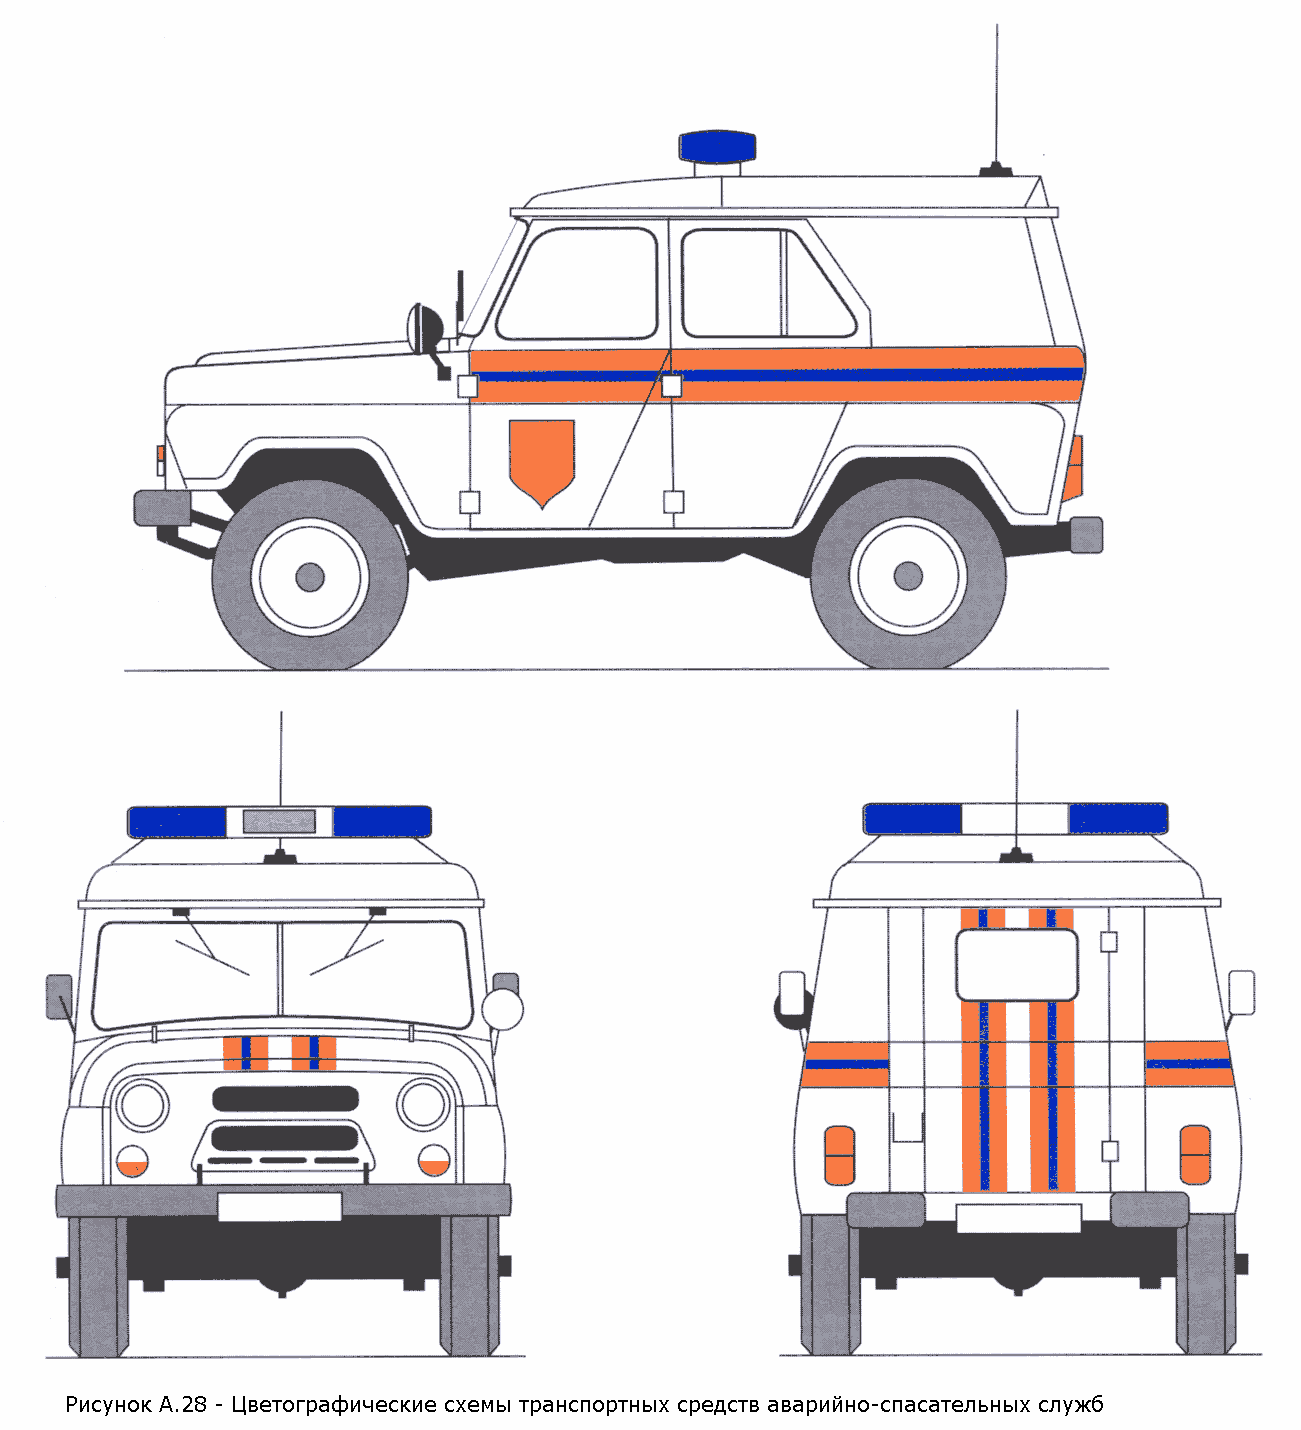 РИСУНОК А.28 (К ГОСТ Р 50574-2002)